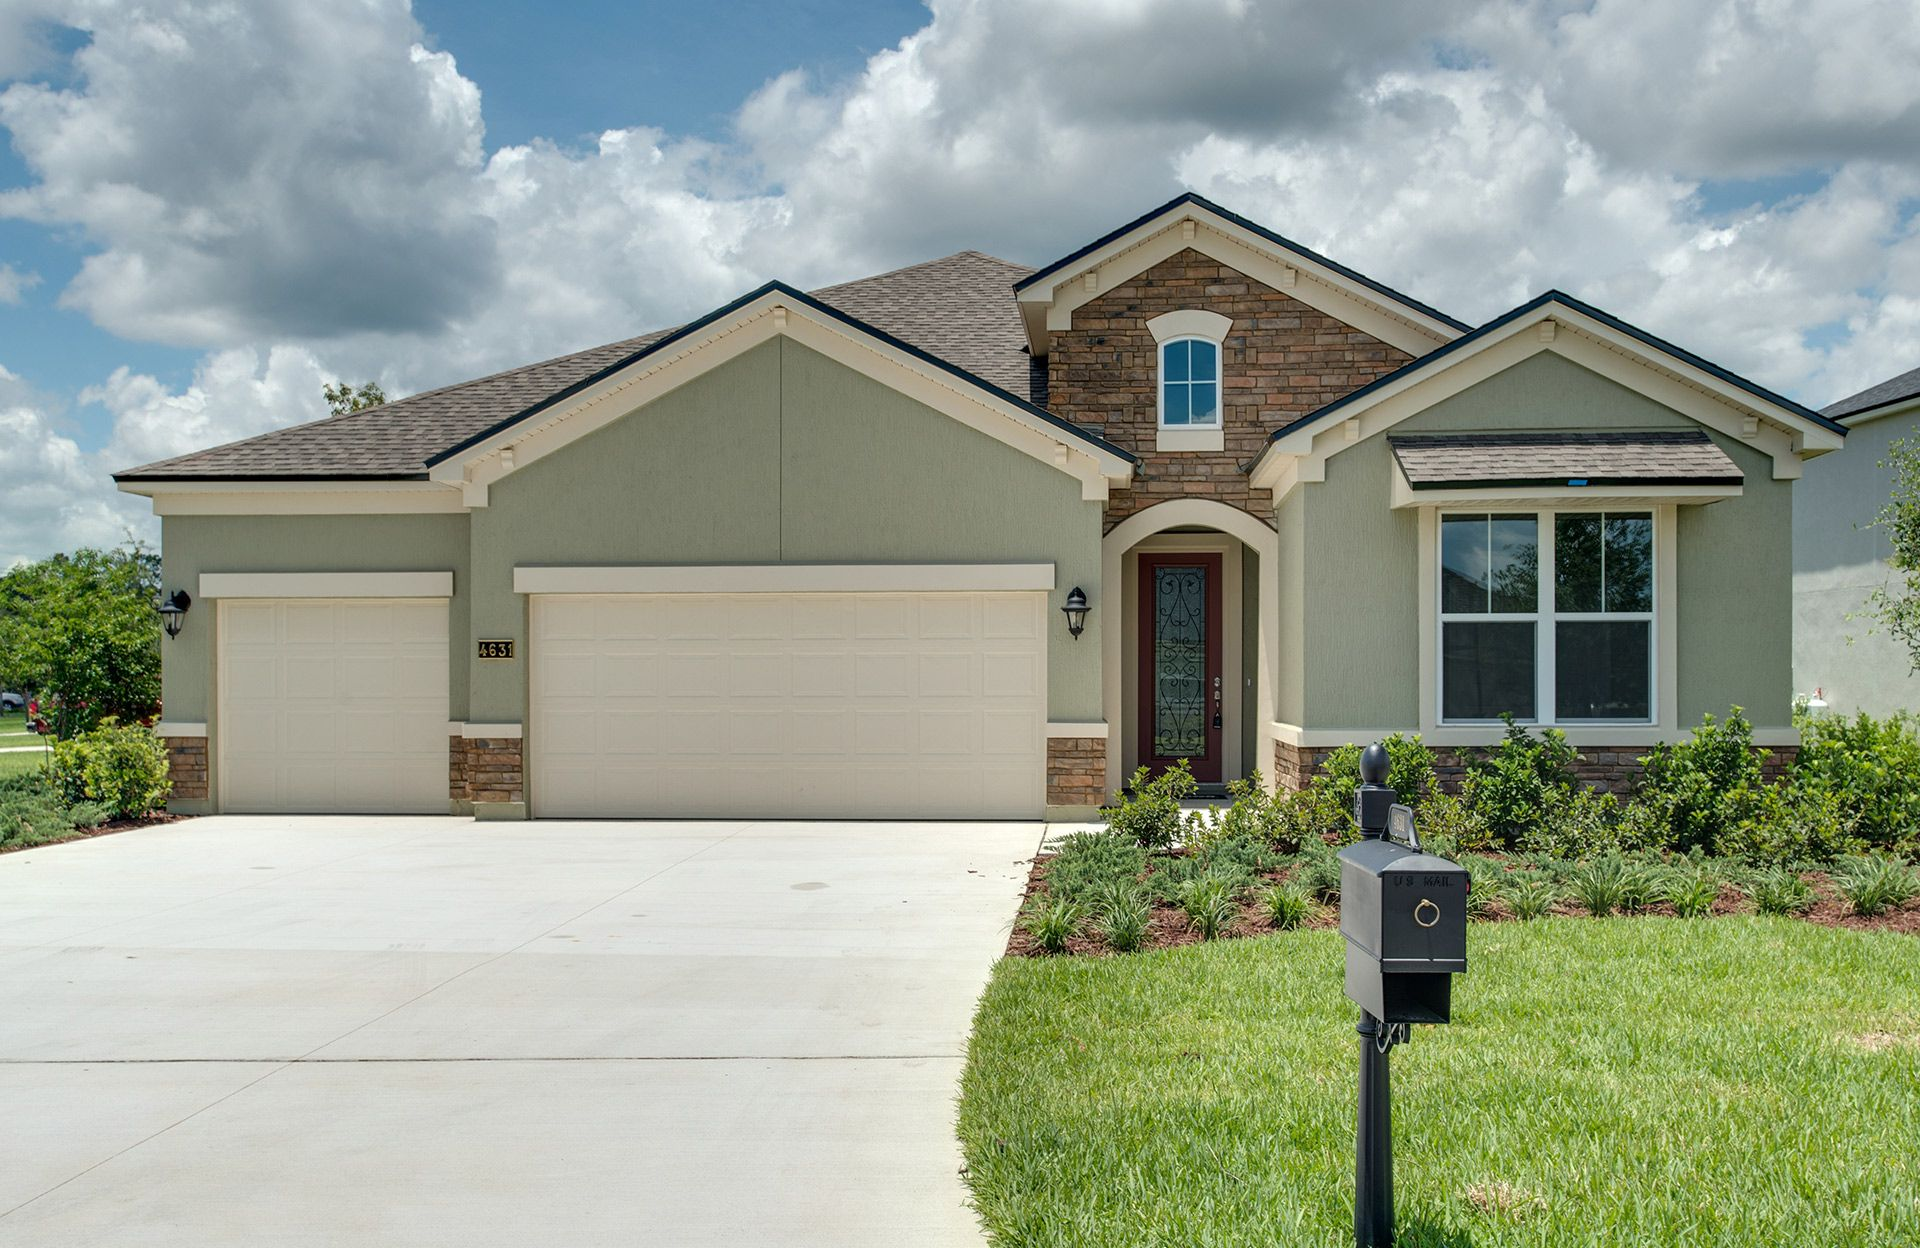 Real Estate At 4631 Karsten Creek Dr Orange Park In Clay County FL 32065